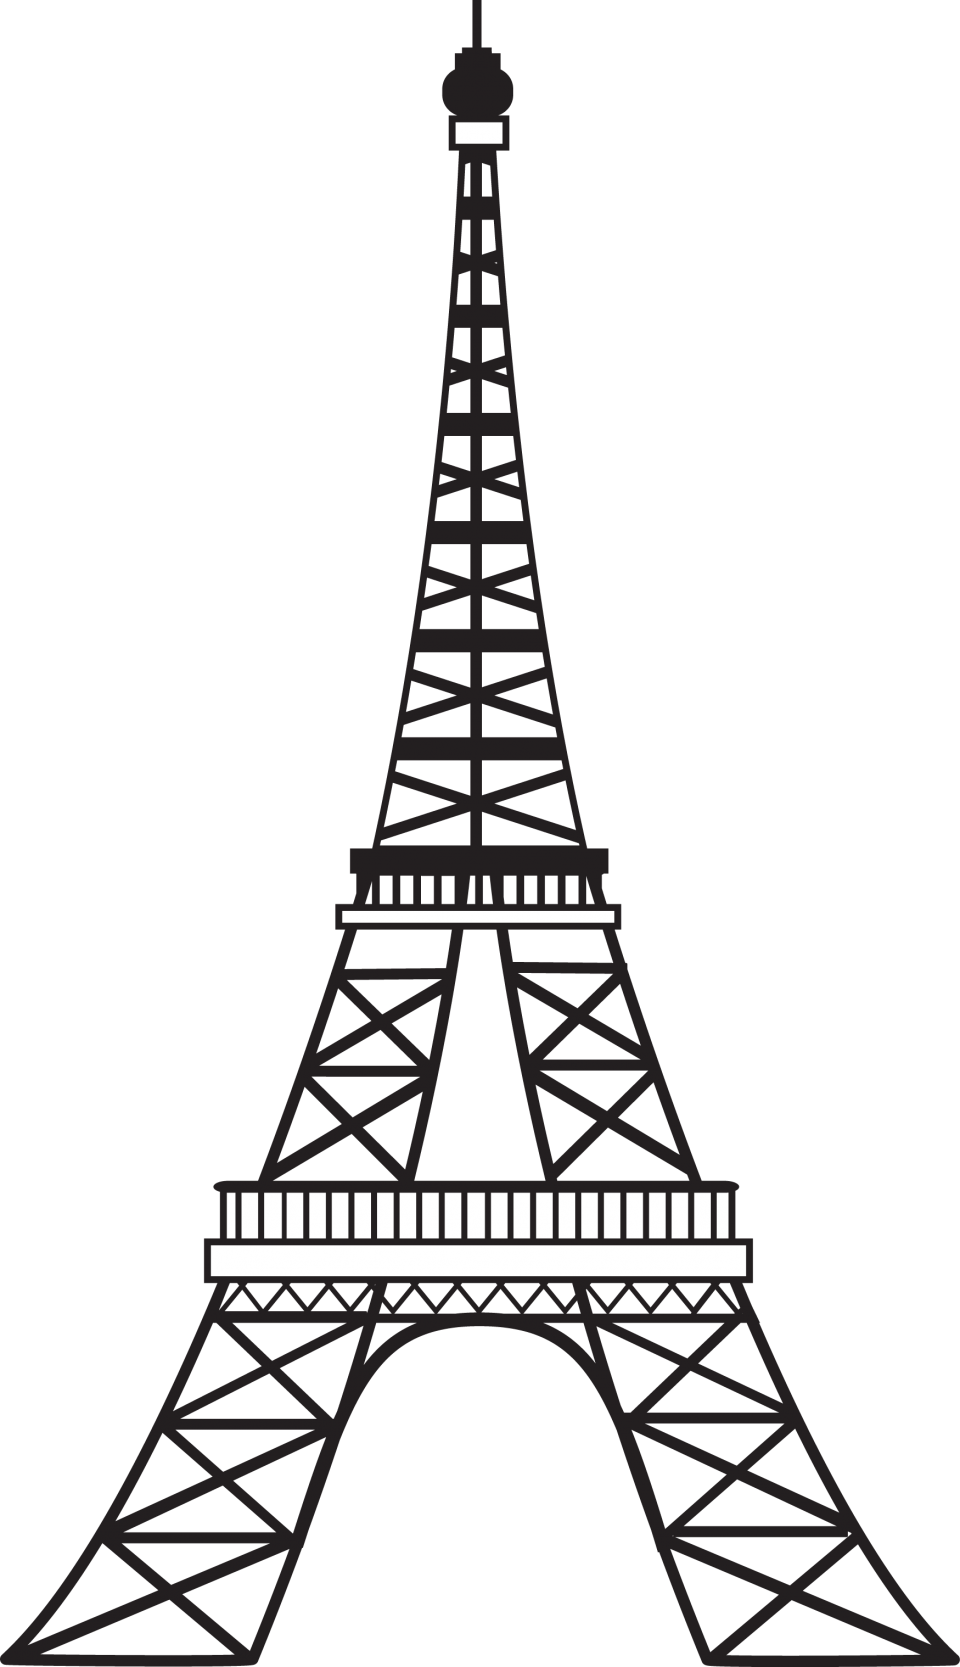 Artist Impression of Eiffel Tower - Paris PNG Image